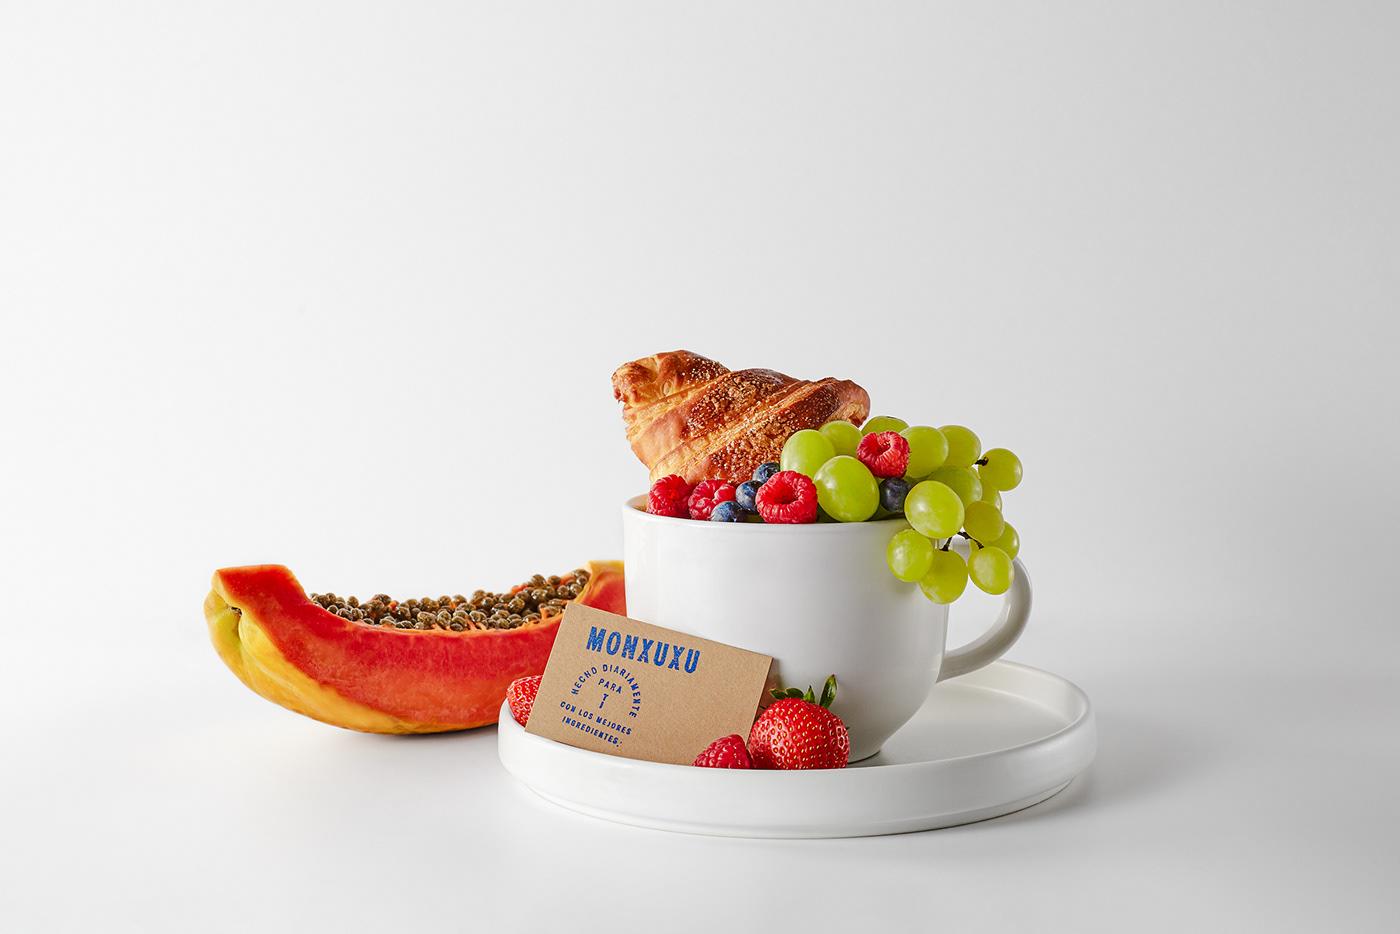 artisanal bakery branding  coffee shop mexico MONXUXU vegrande